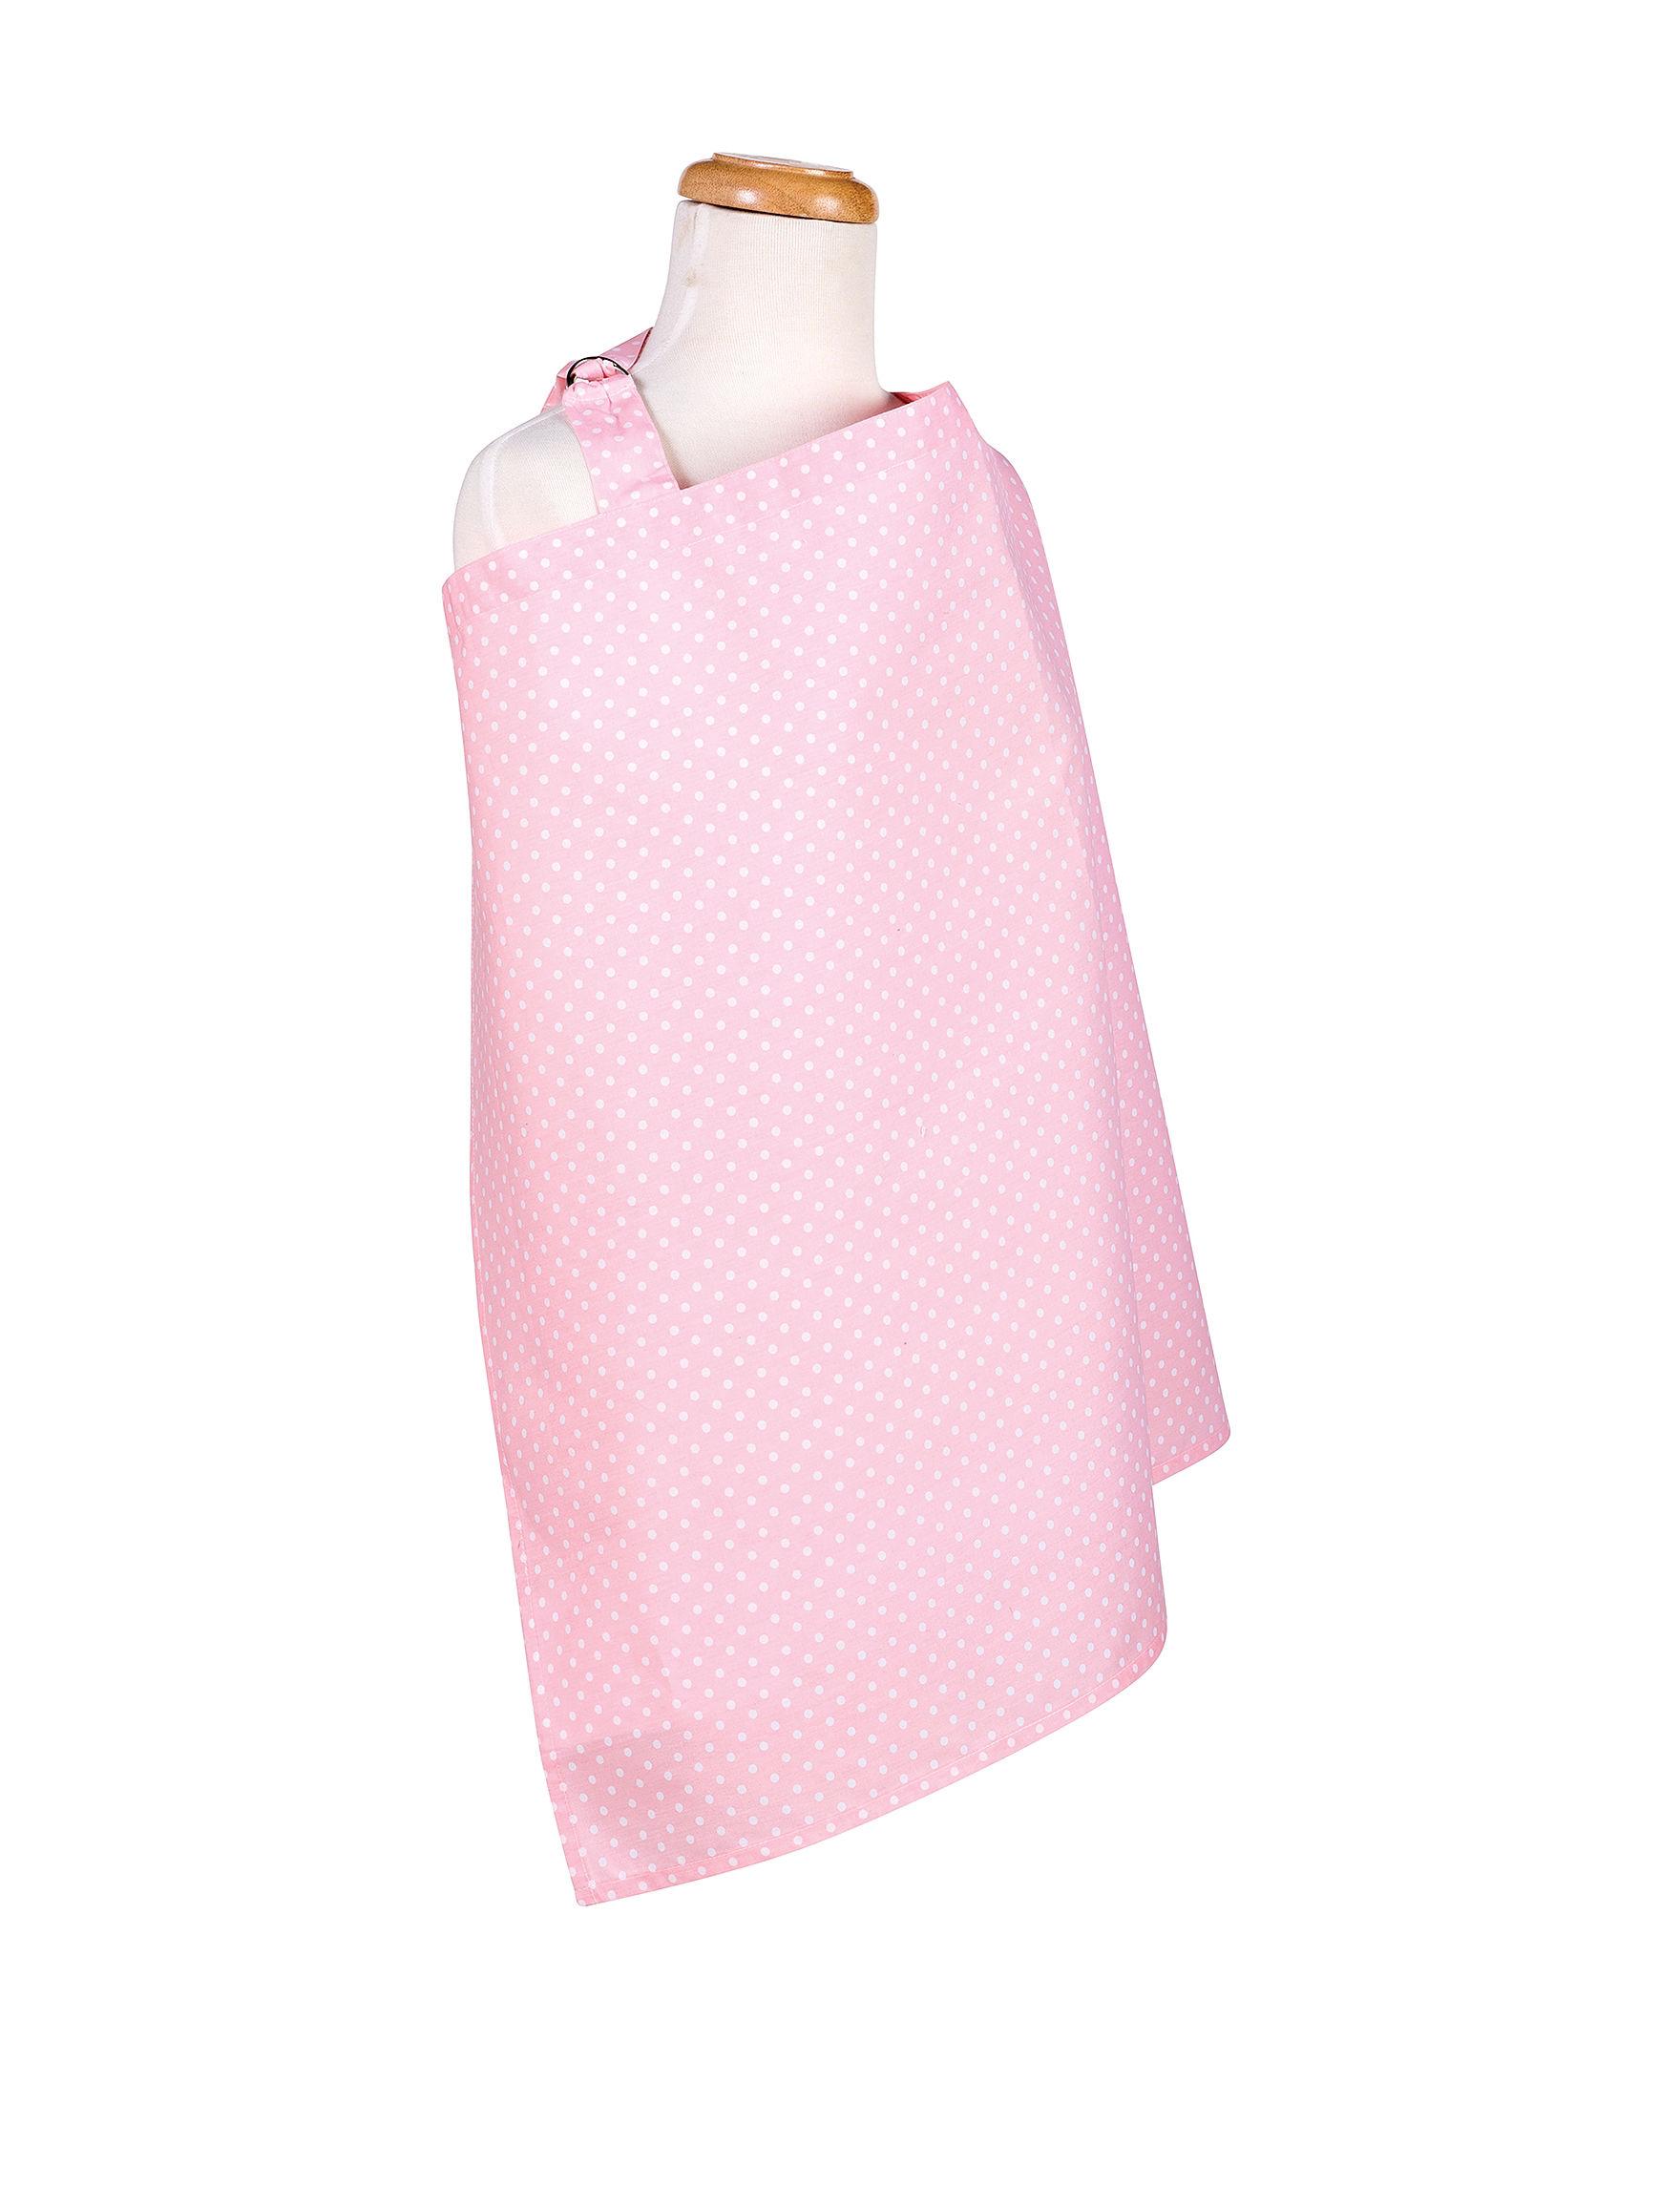 Trend Lab Pink / White Breastfeeding